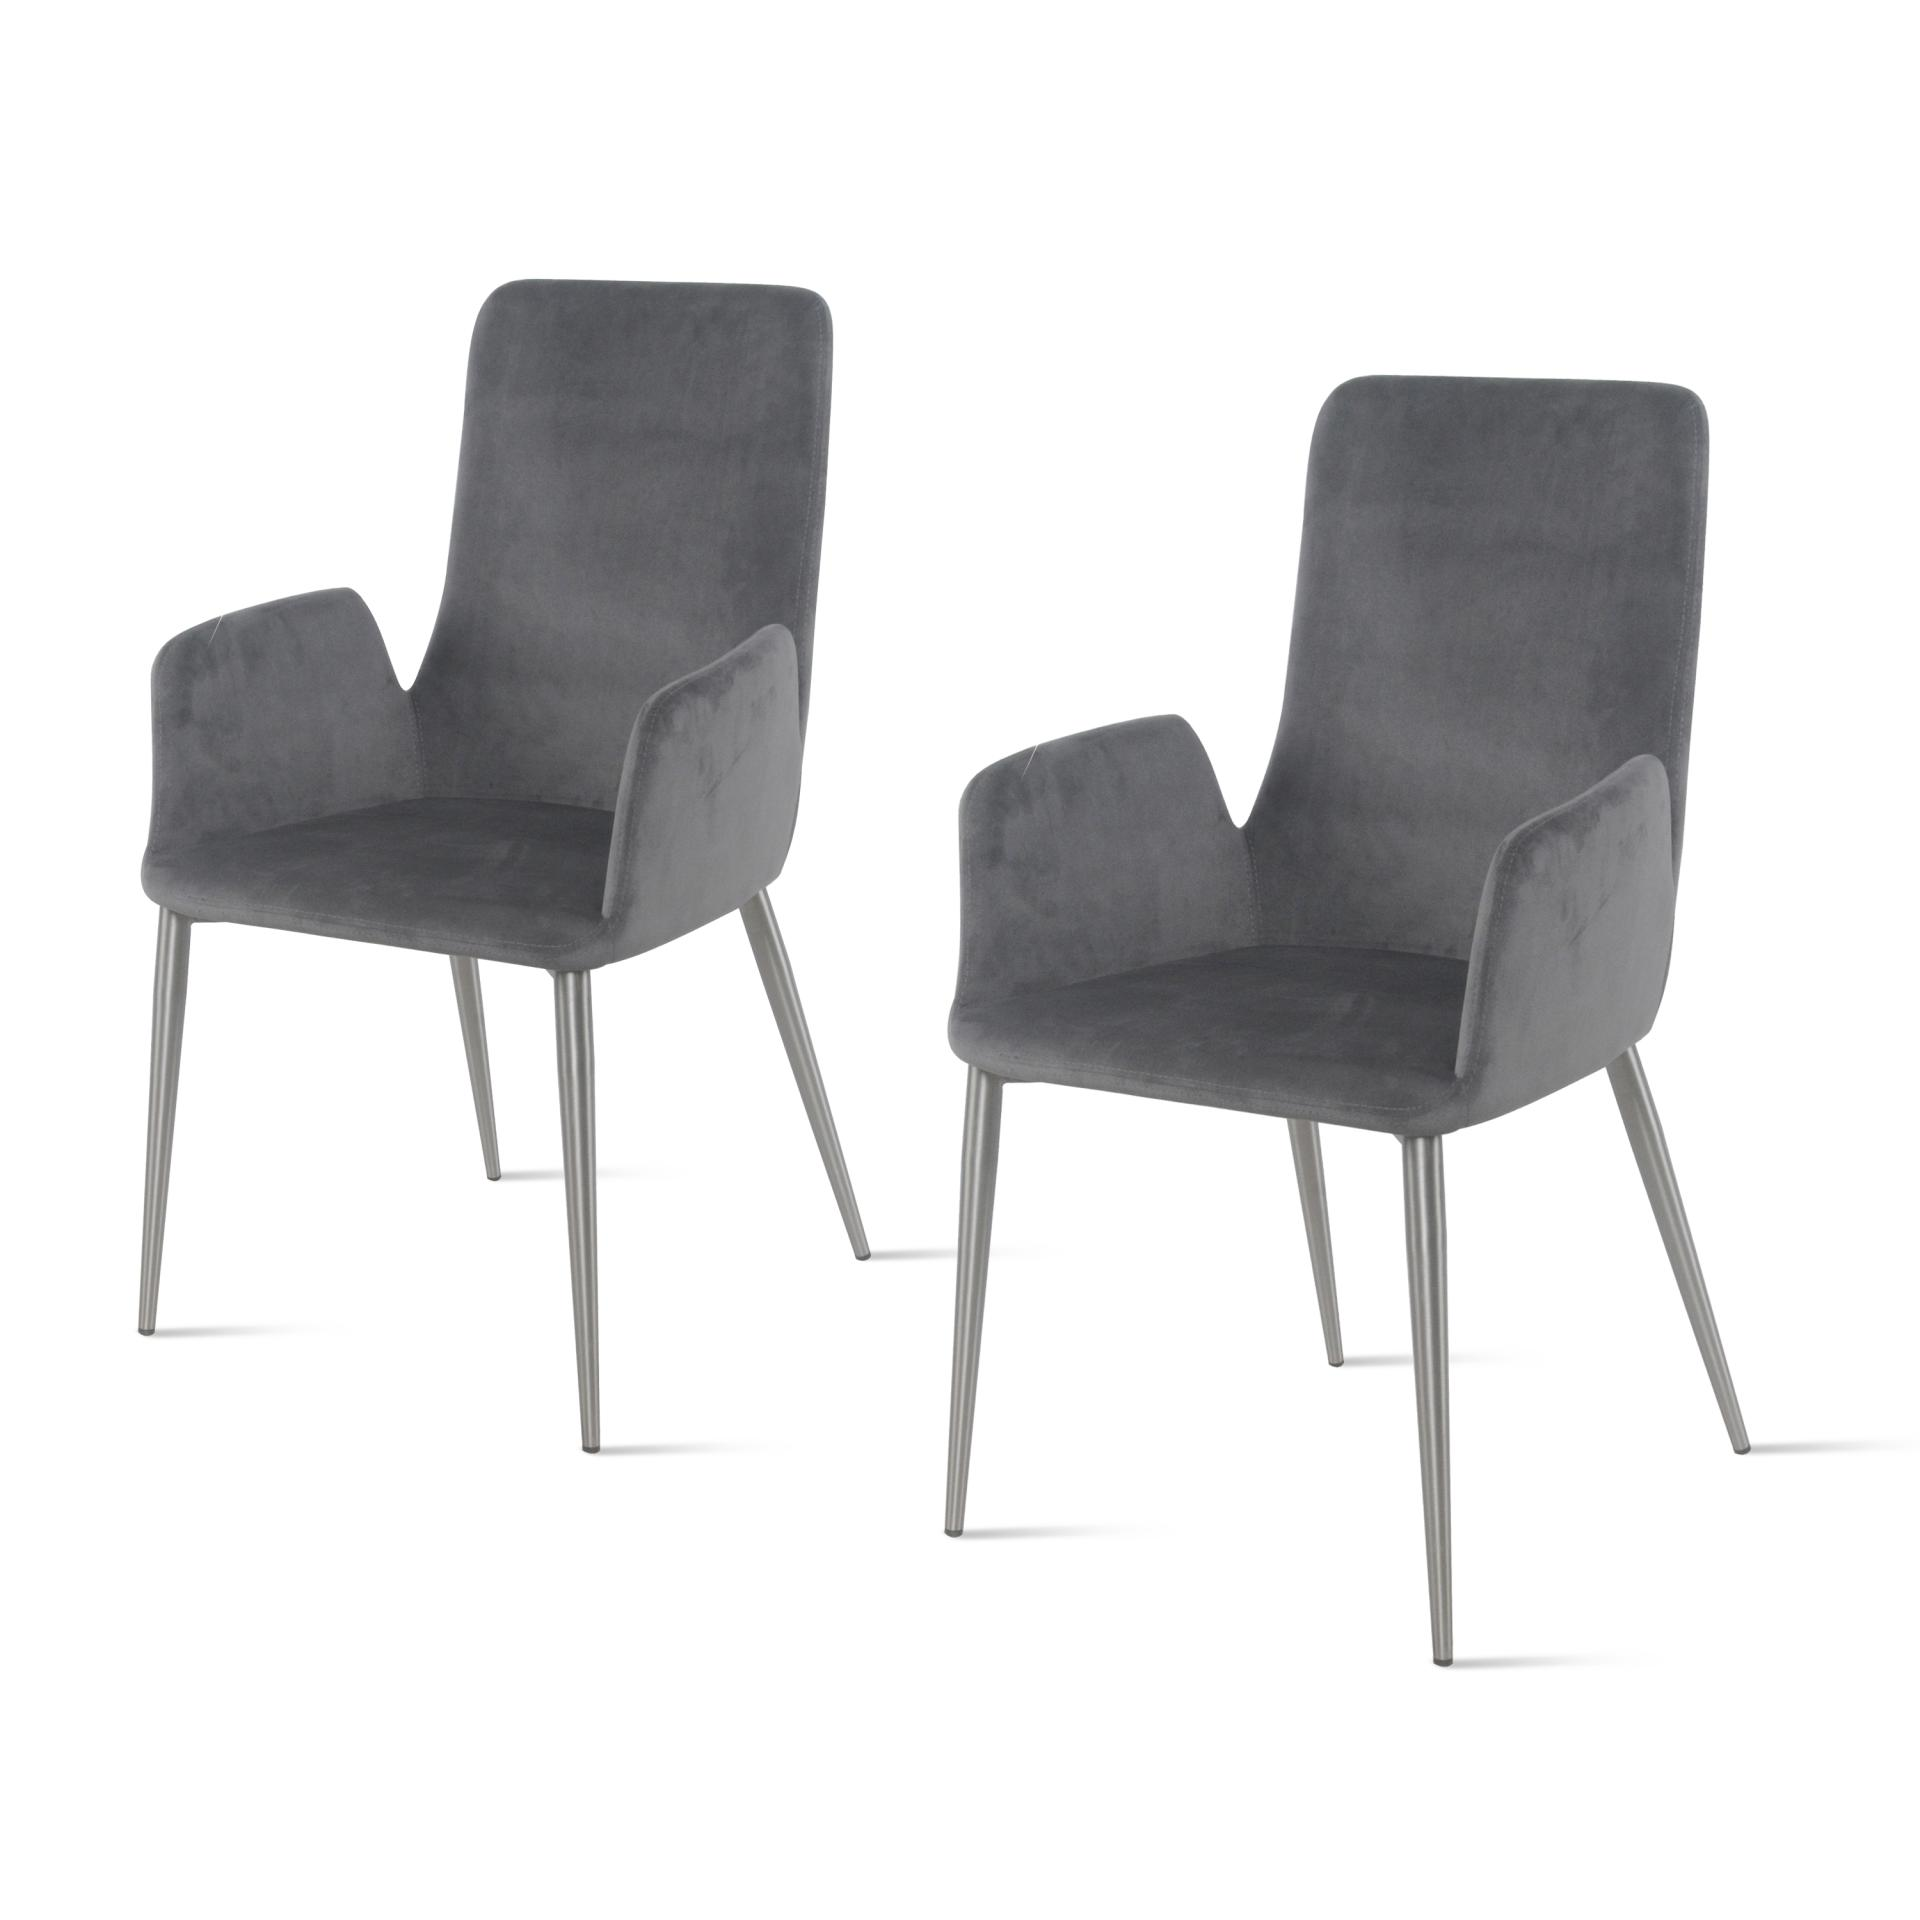 4400039 Nf Npd Furniture Wholesale Lifestyle Furniture